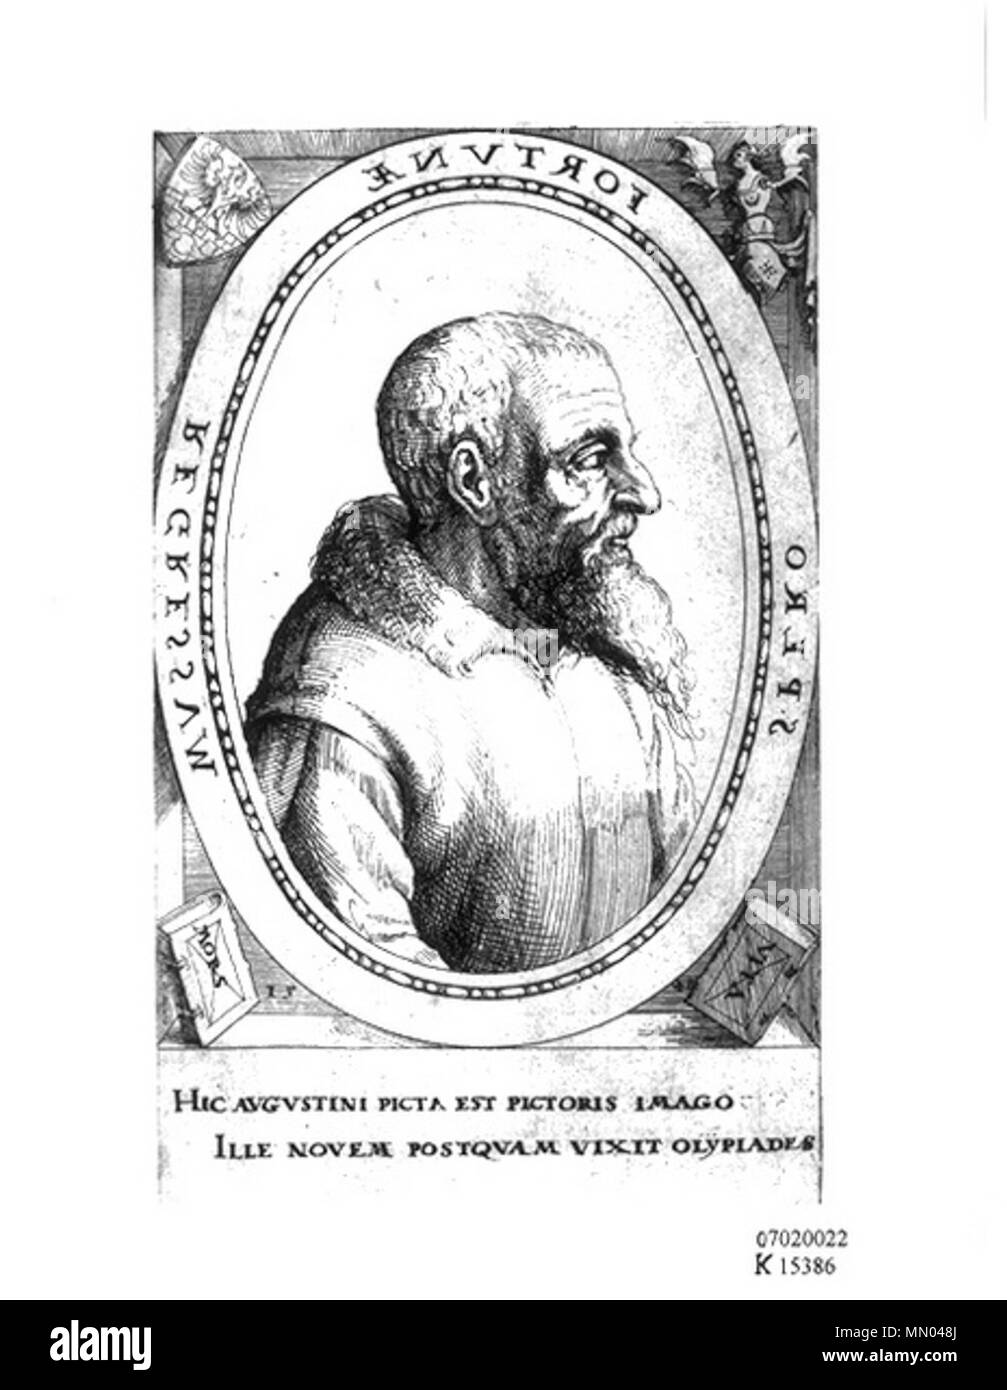 . German engraver, etcher and printmaker Hirschvogel Self Portrait 2 - Stock Image